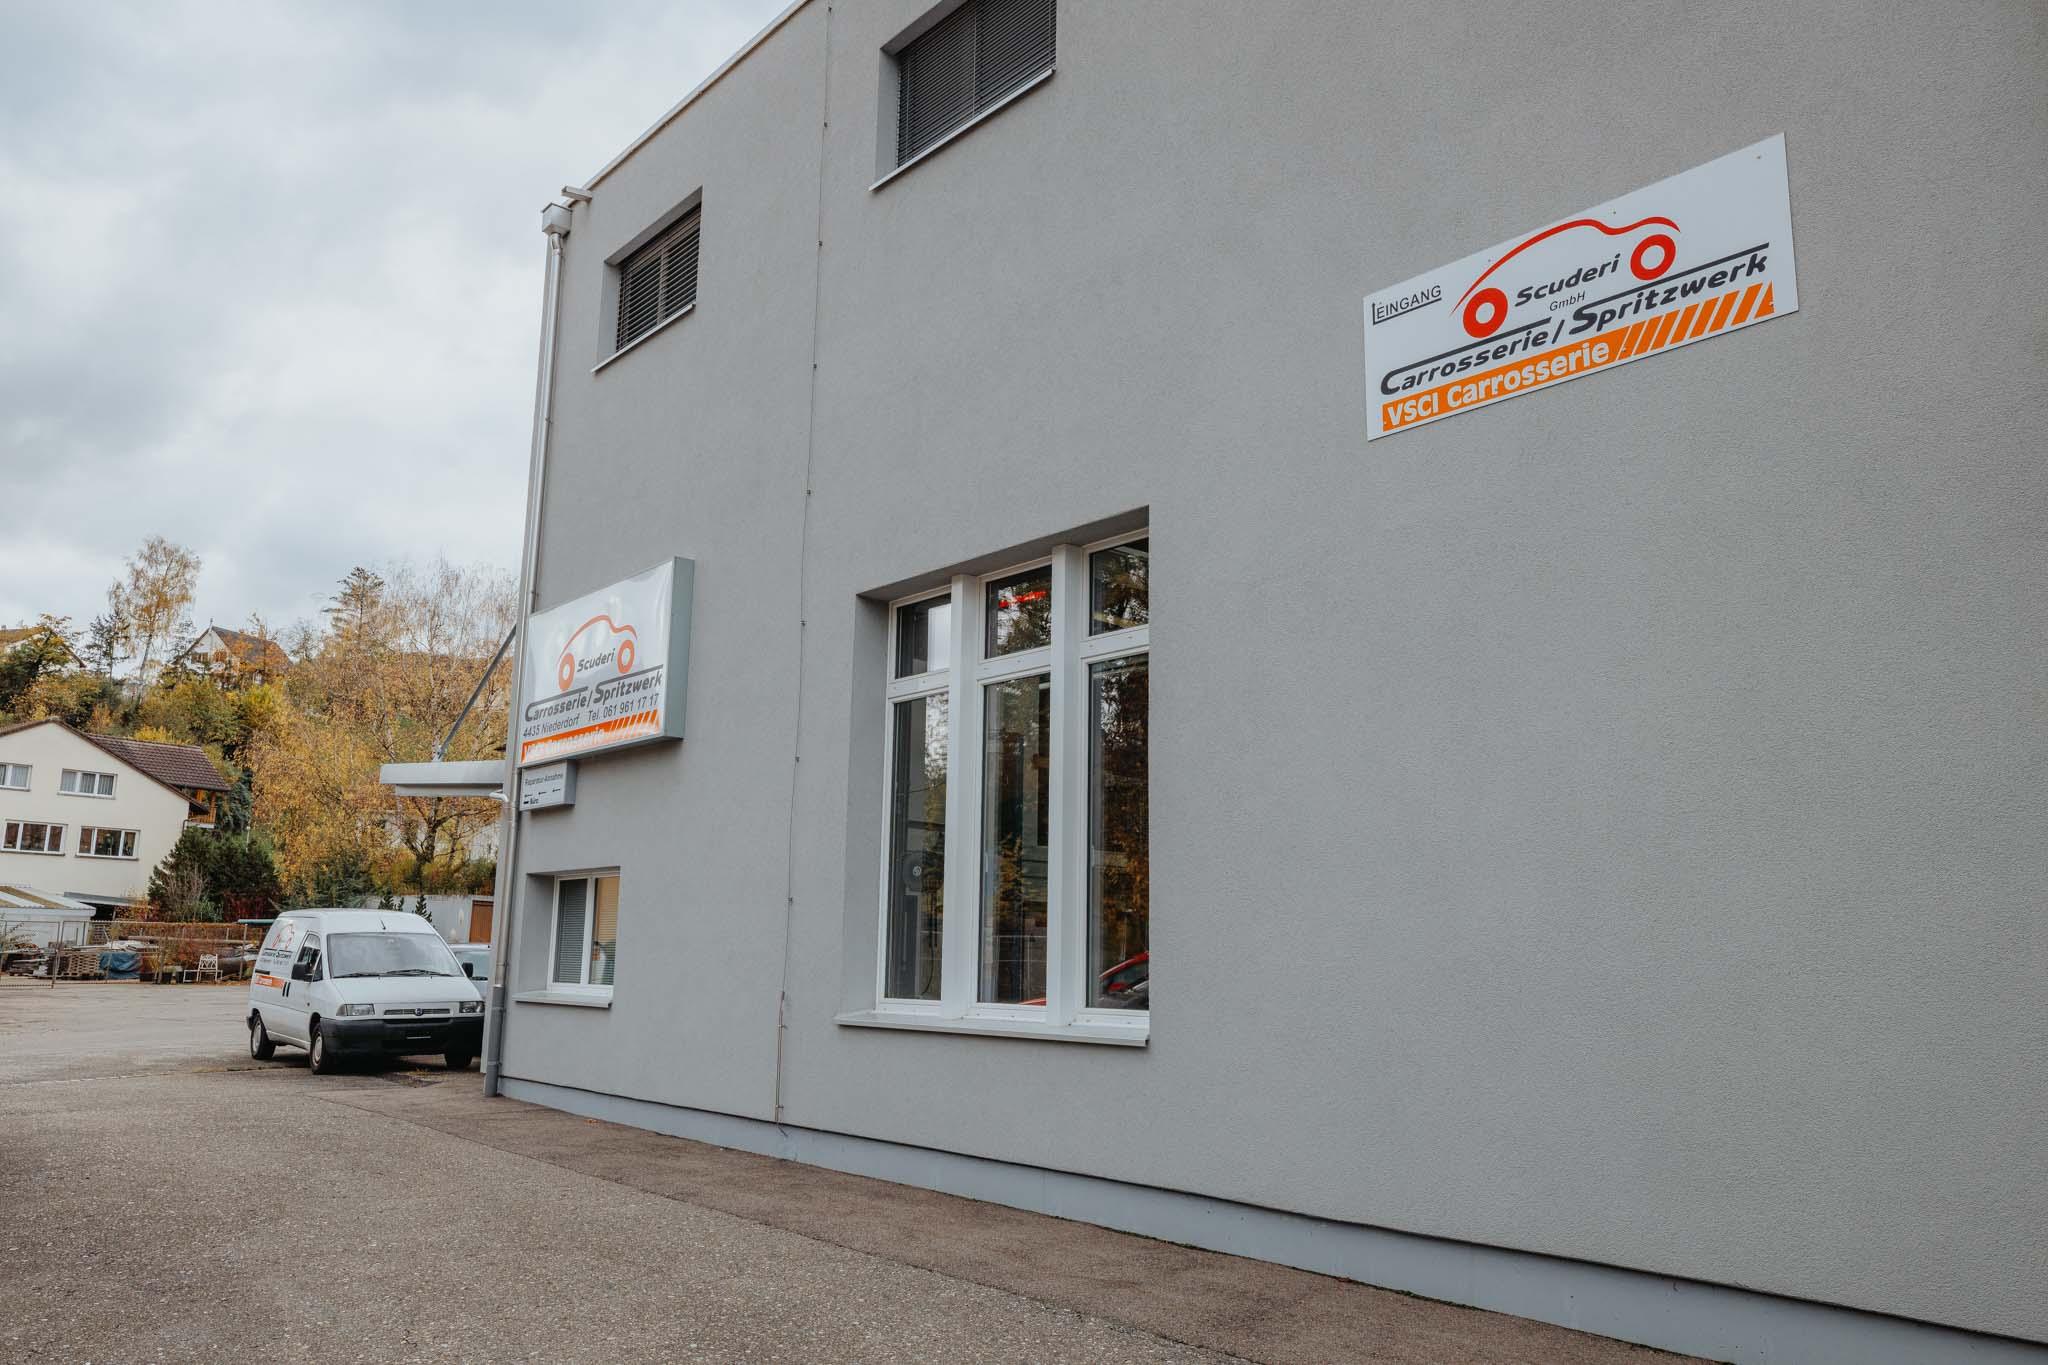 019-Carrosserie-Spritzwerk-Scuderi